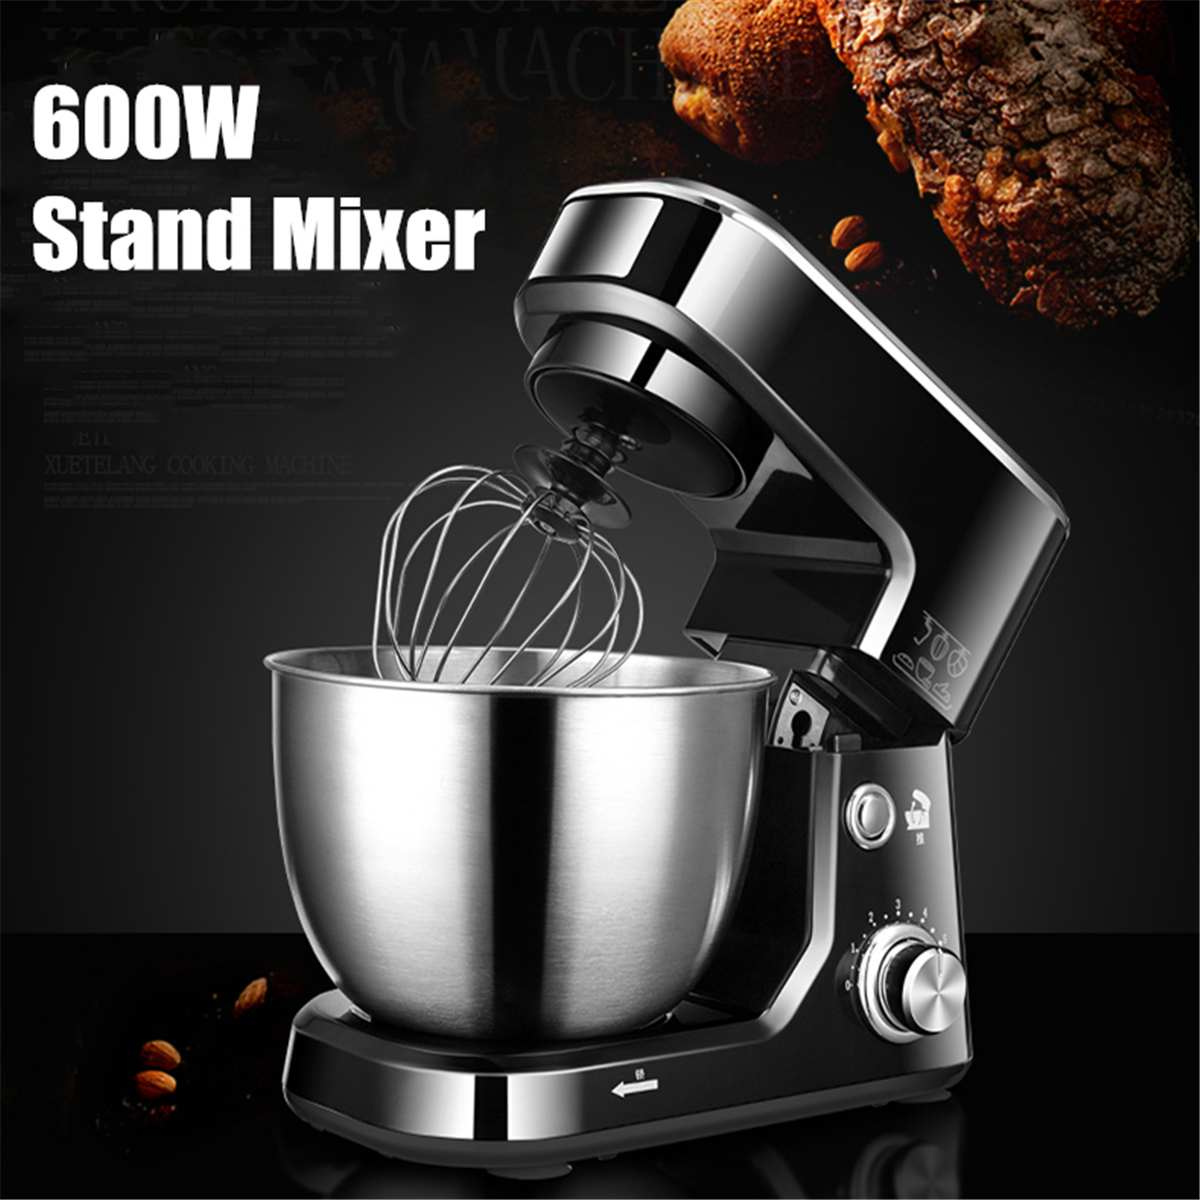 1200W 4L Bowl lift Stand Mixer Kitchen Stand High Power Food PMilkshake/Cake Dough Kneading Machine Blenders Home Smoothie Maker